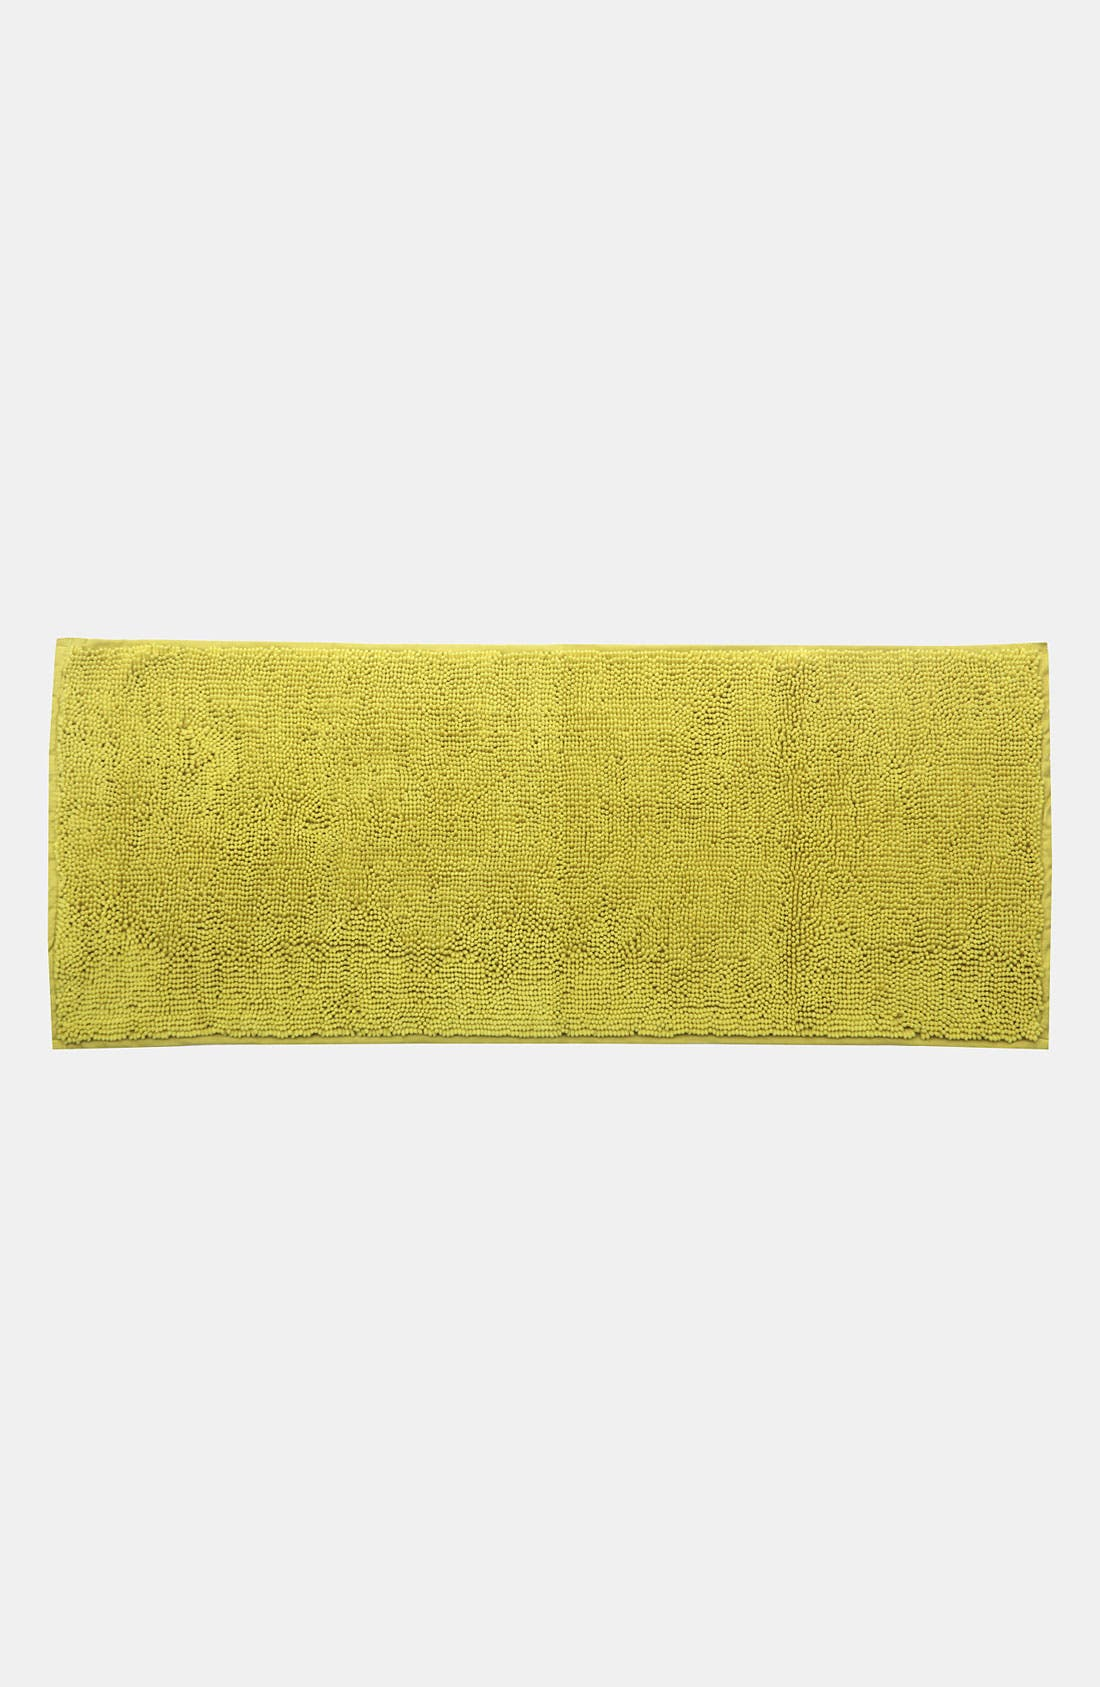 Main Image - Blissliving Home 'Heather Elderberry - Large' Bath Mat (Online Only)